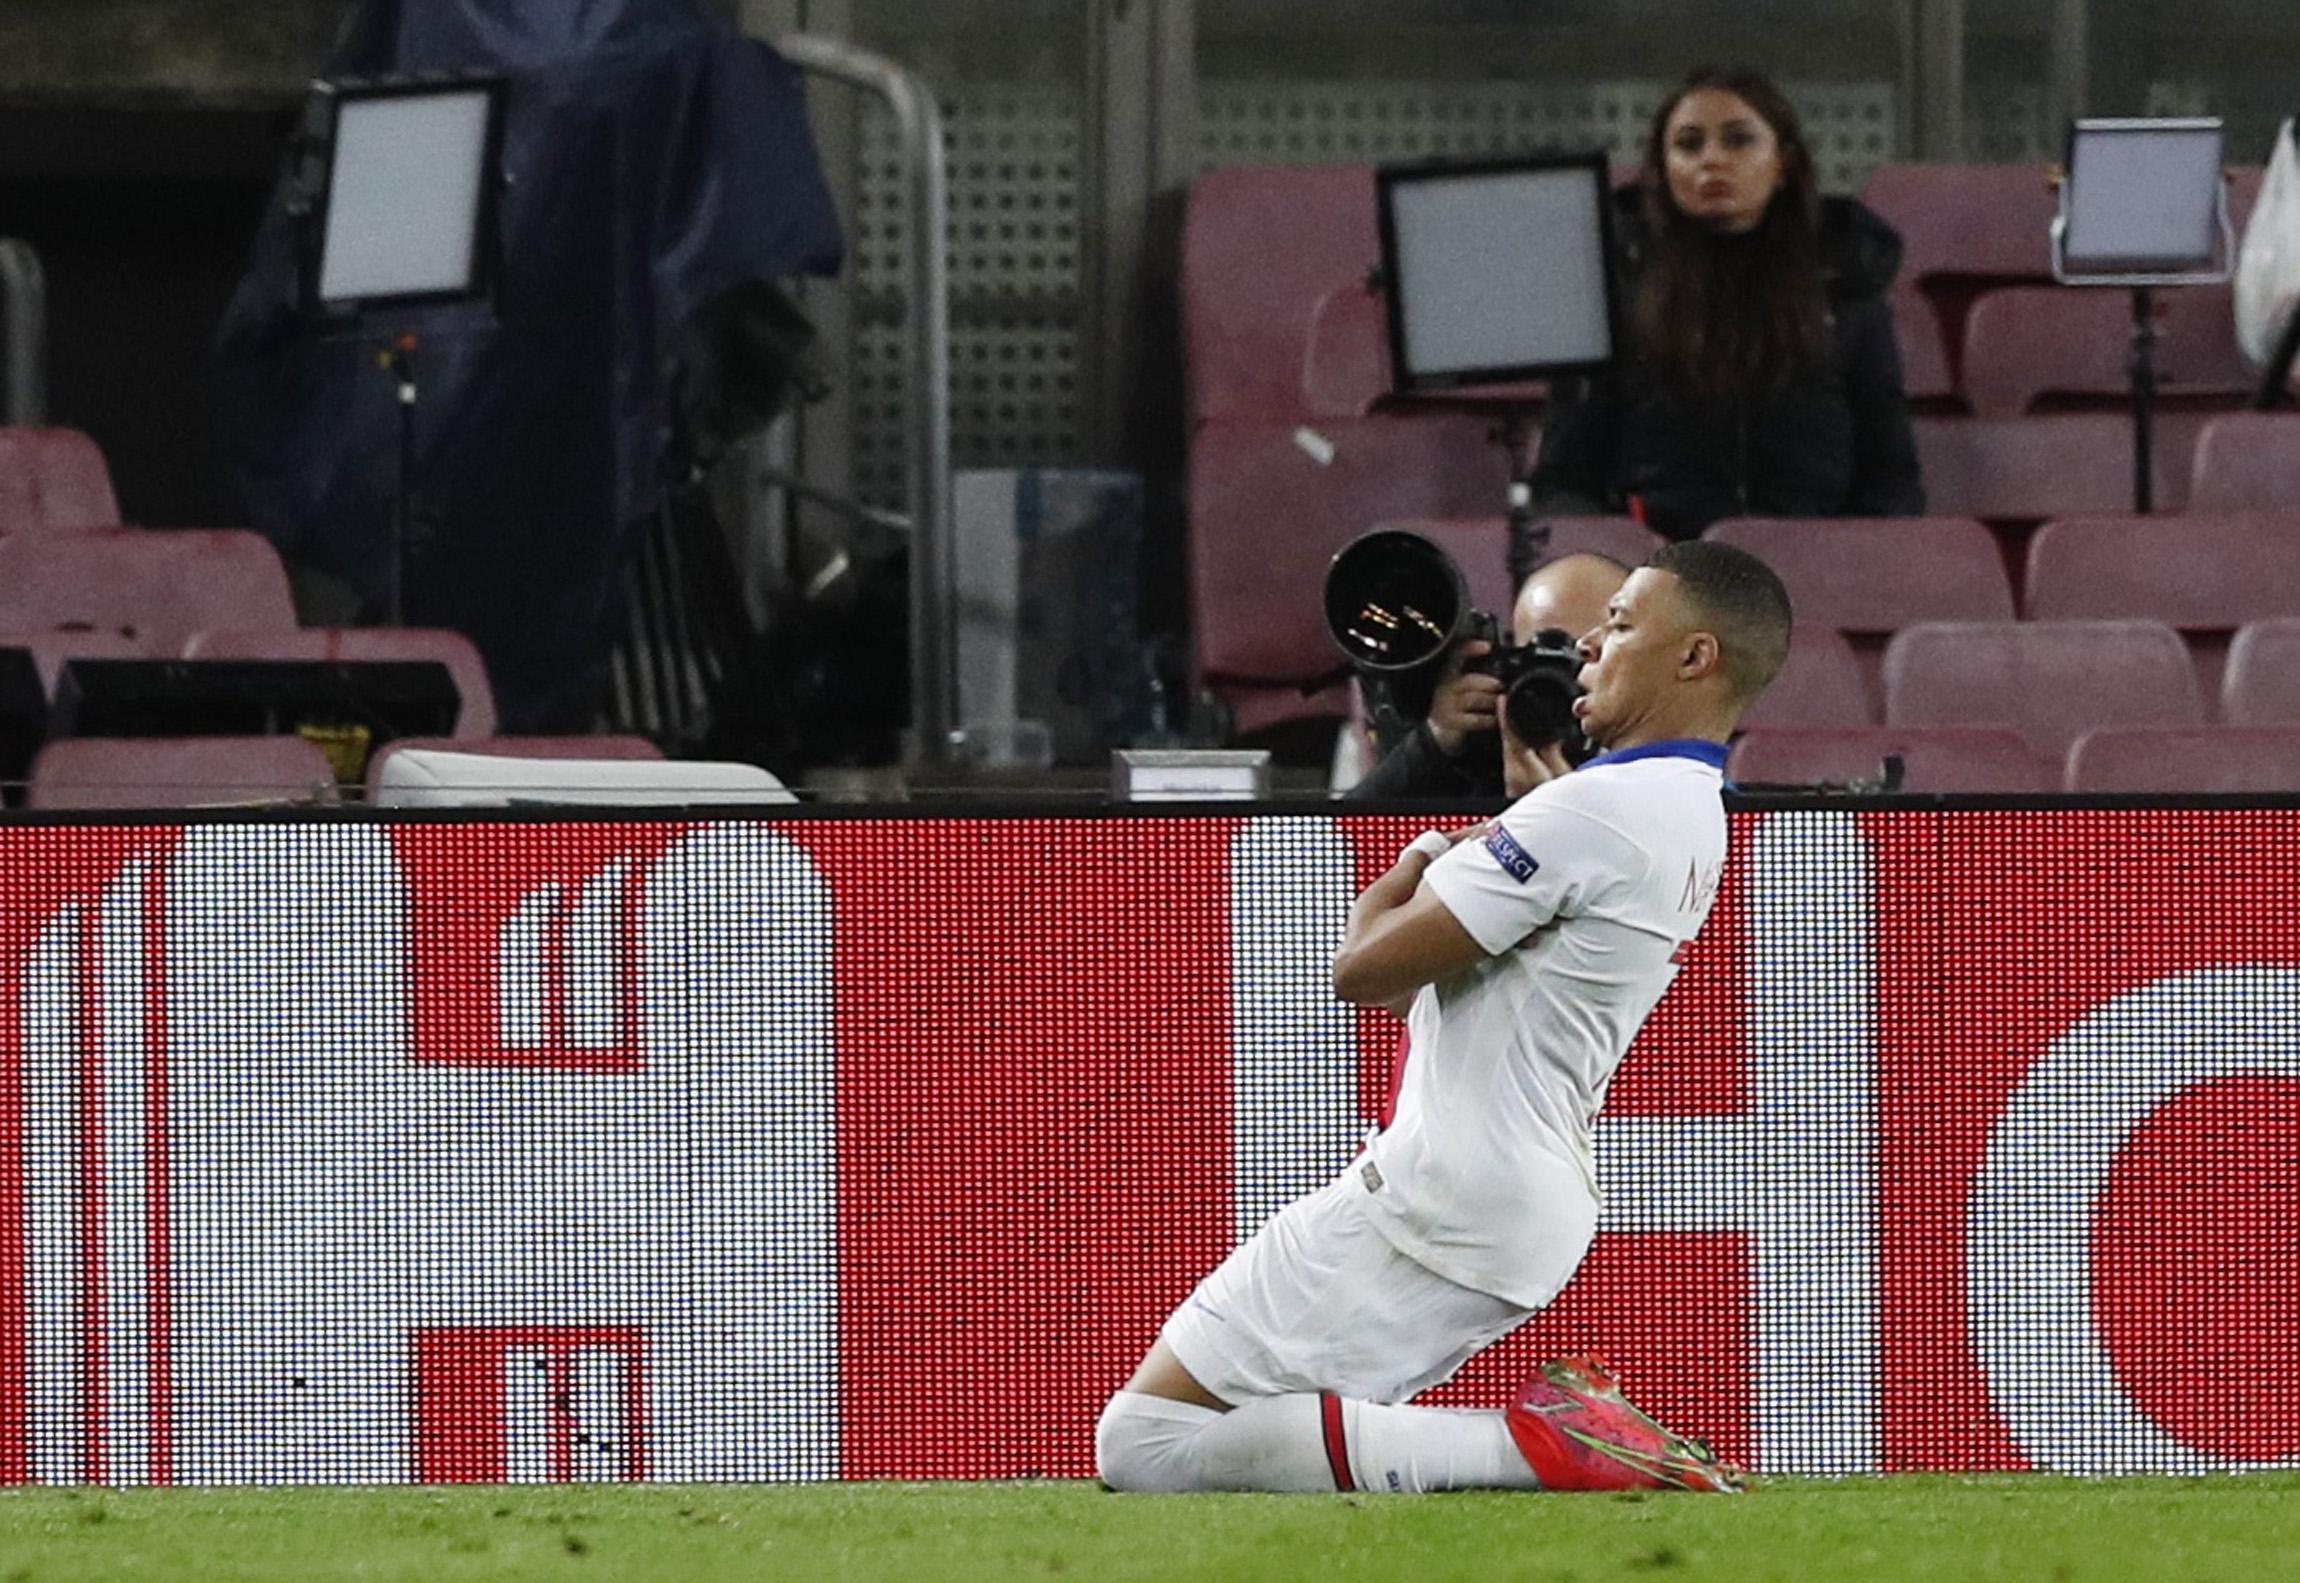 Champions League ΤΕΛΙΚΑ: Μπαρτσελόνα – Παρί Σεν Ζερμέν 1-4, Λειψία – Λίβερπουλ 0-2